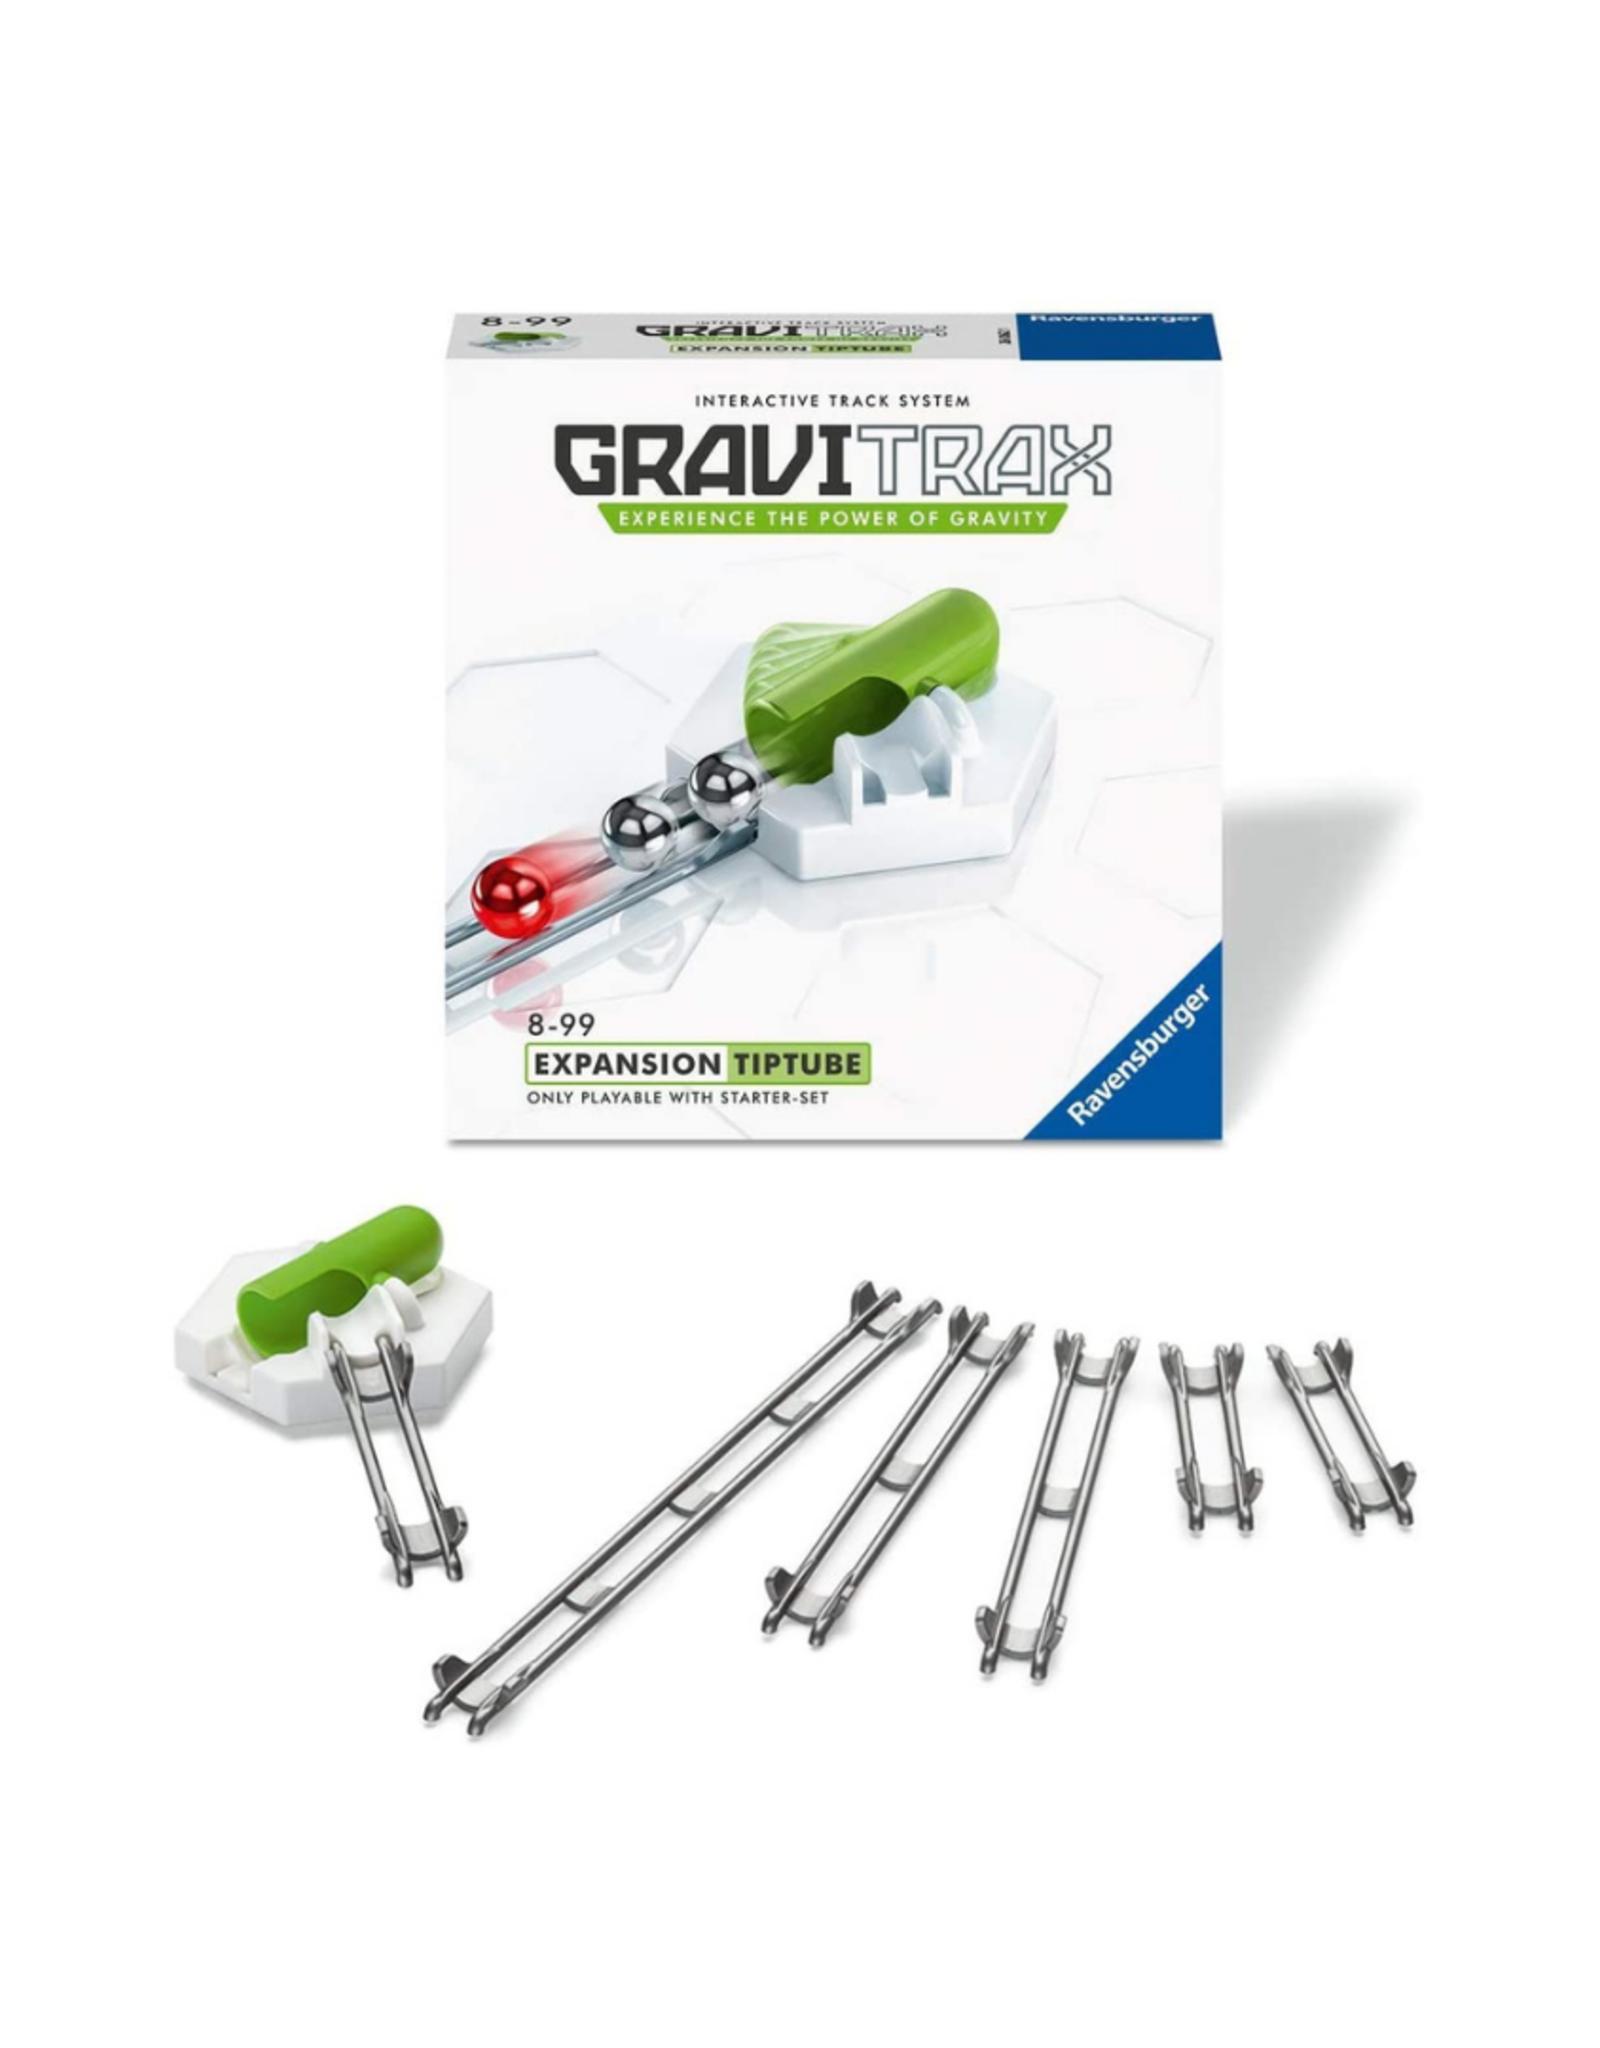 GraviTrax GraviTrax Accessory - Tip Tube